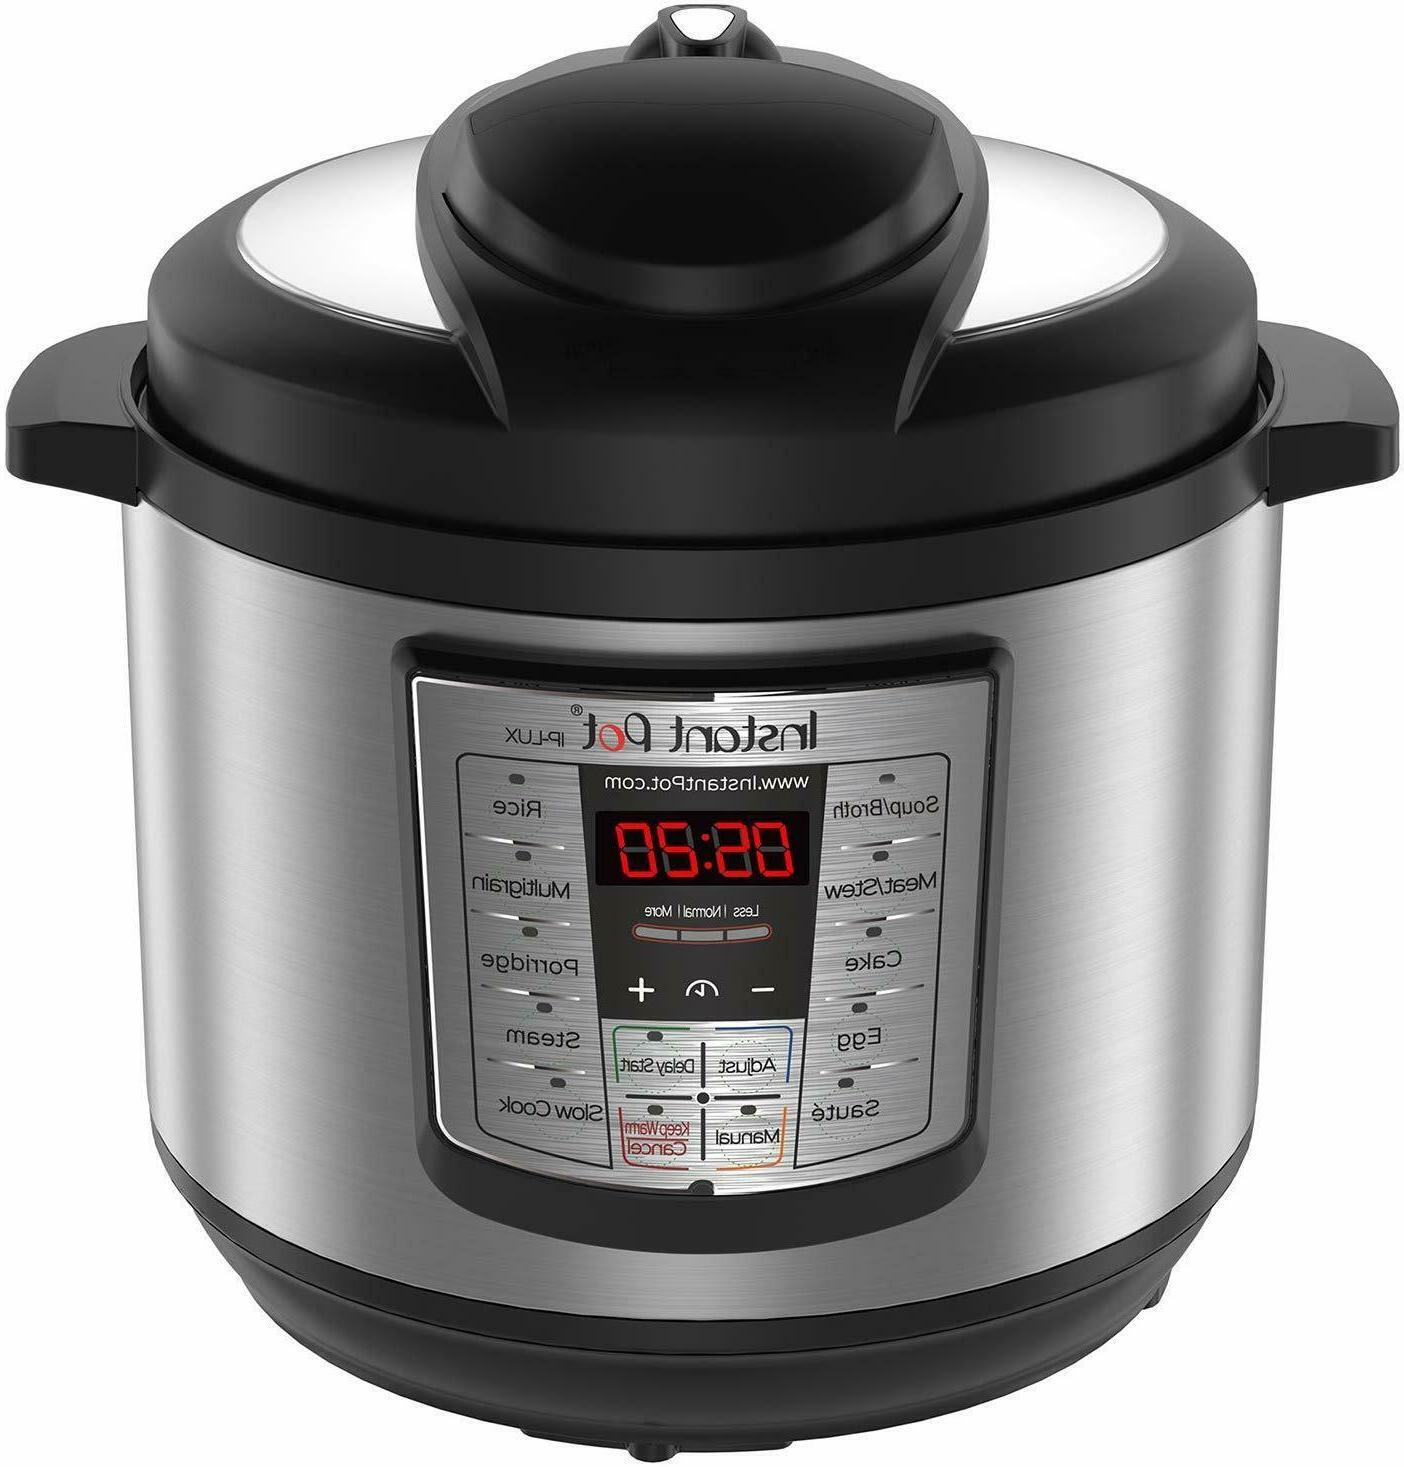 Instant Pot Qt 6-In-1 Pressure Cooker,